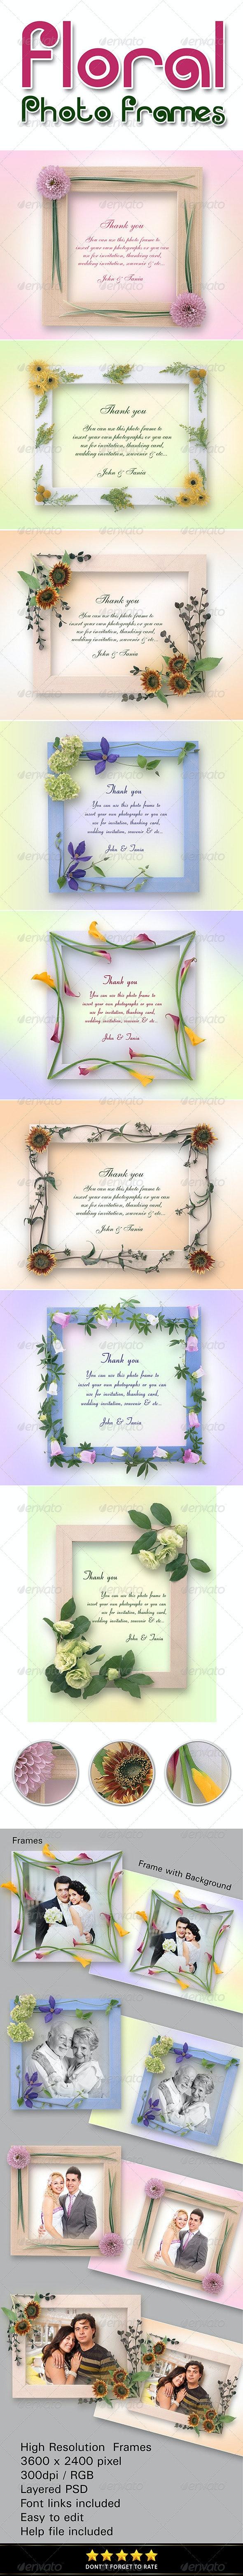 Floral Photo Frames - Photo Templates Graphics